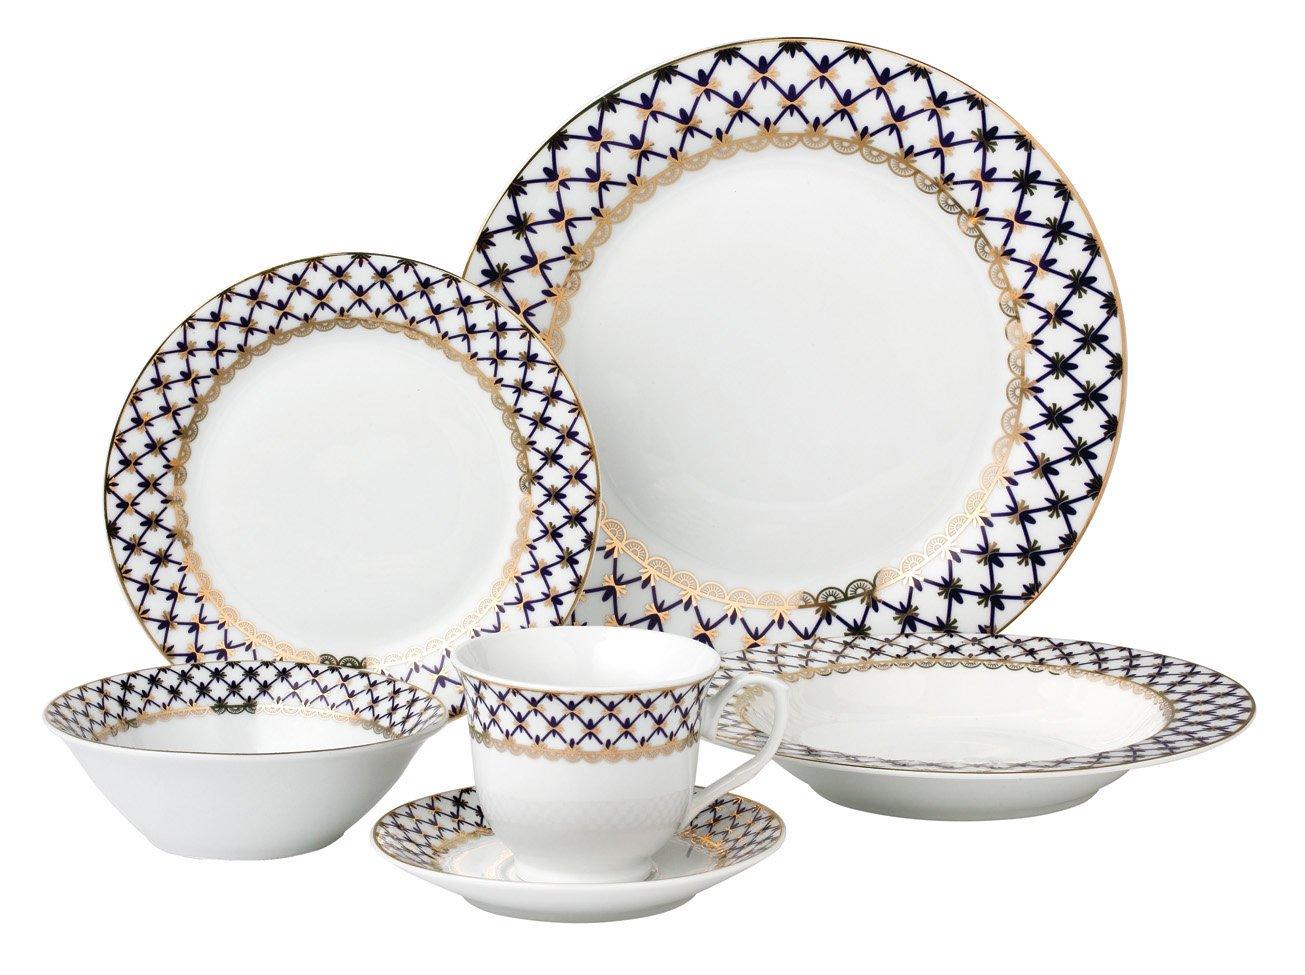 Blue Lorren Home Trends 24 Piece Porcelain Dinnerware Set Tula